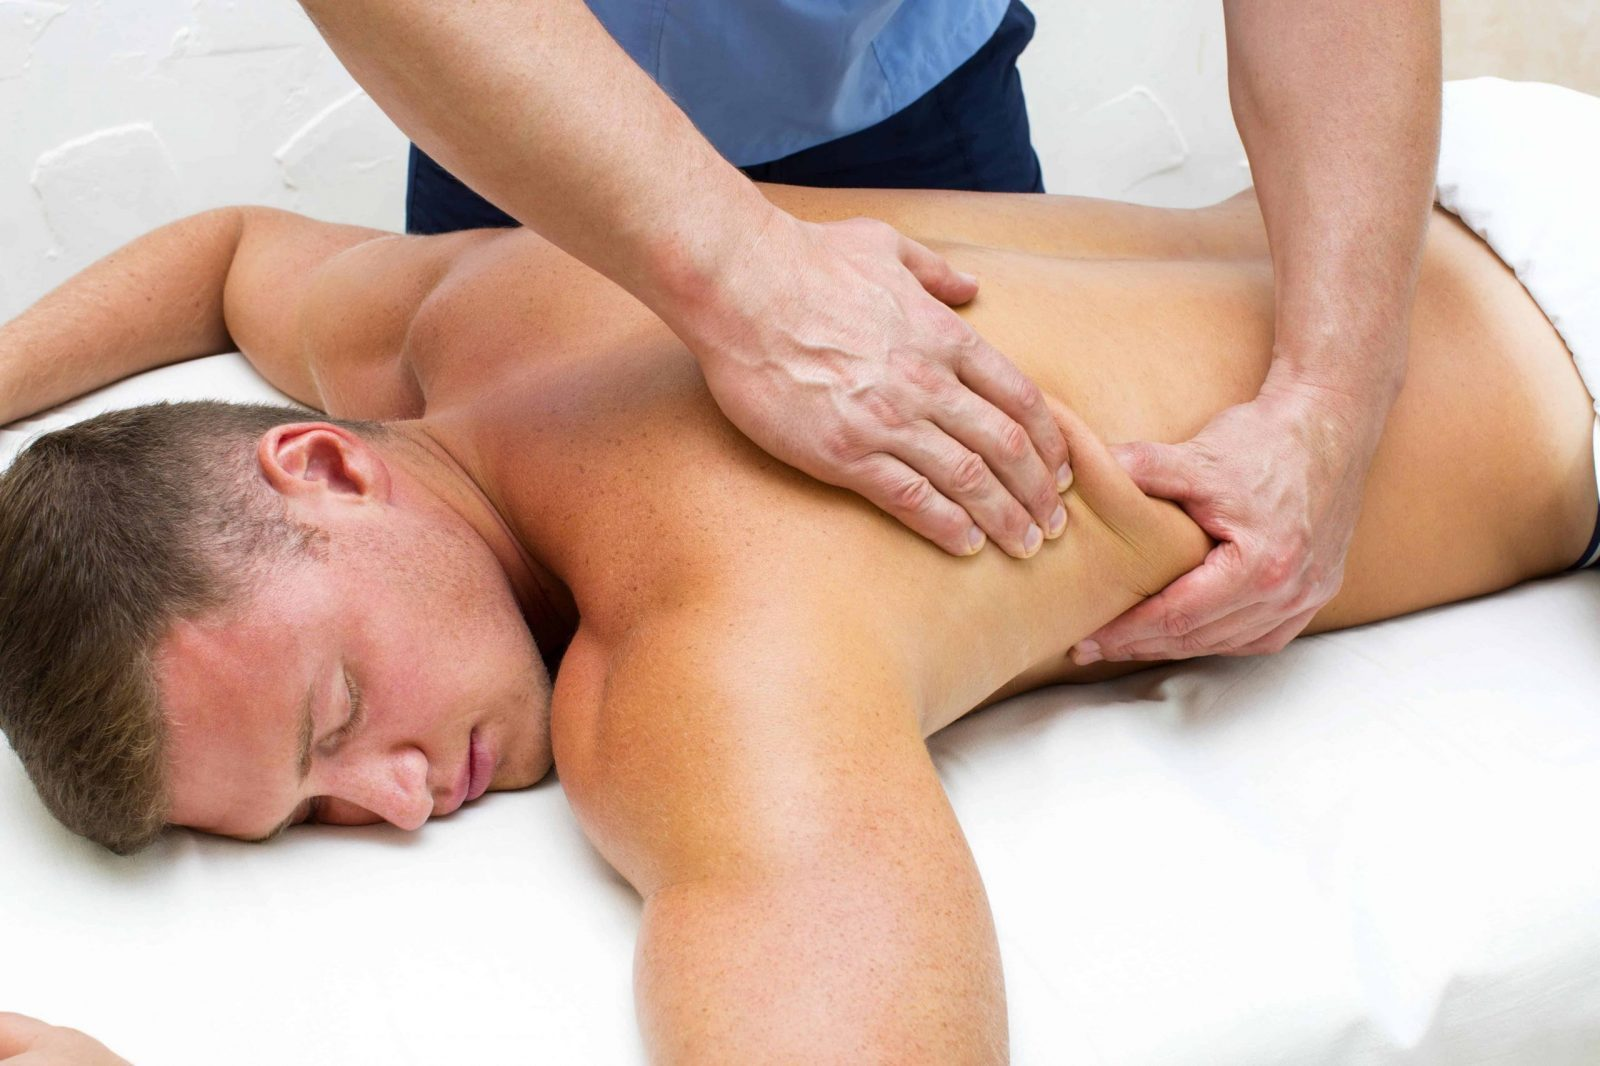 A massage therapist using an advanced technique on a client.